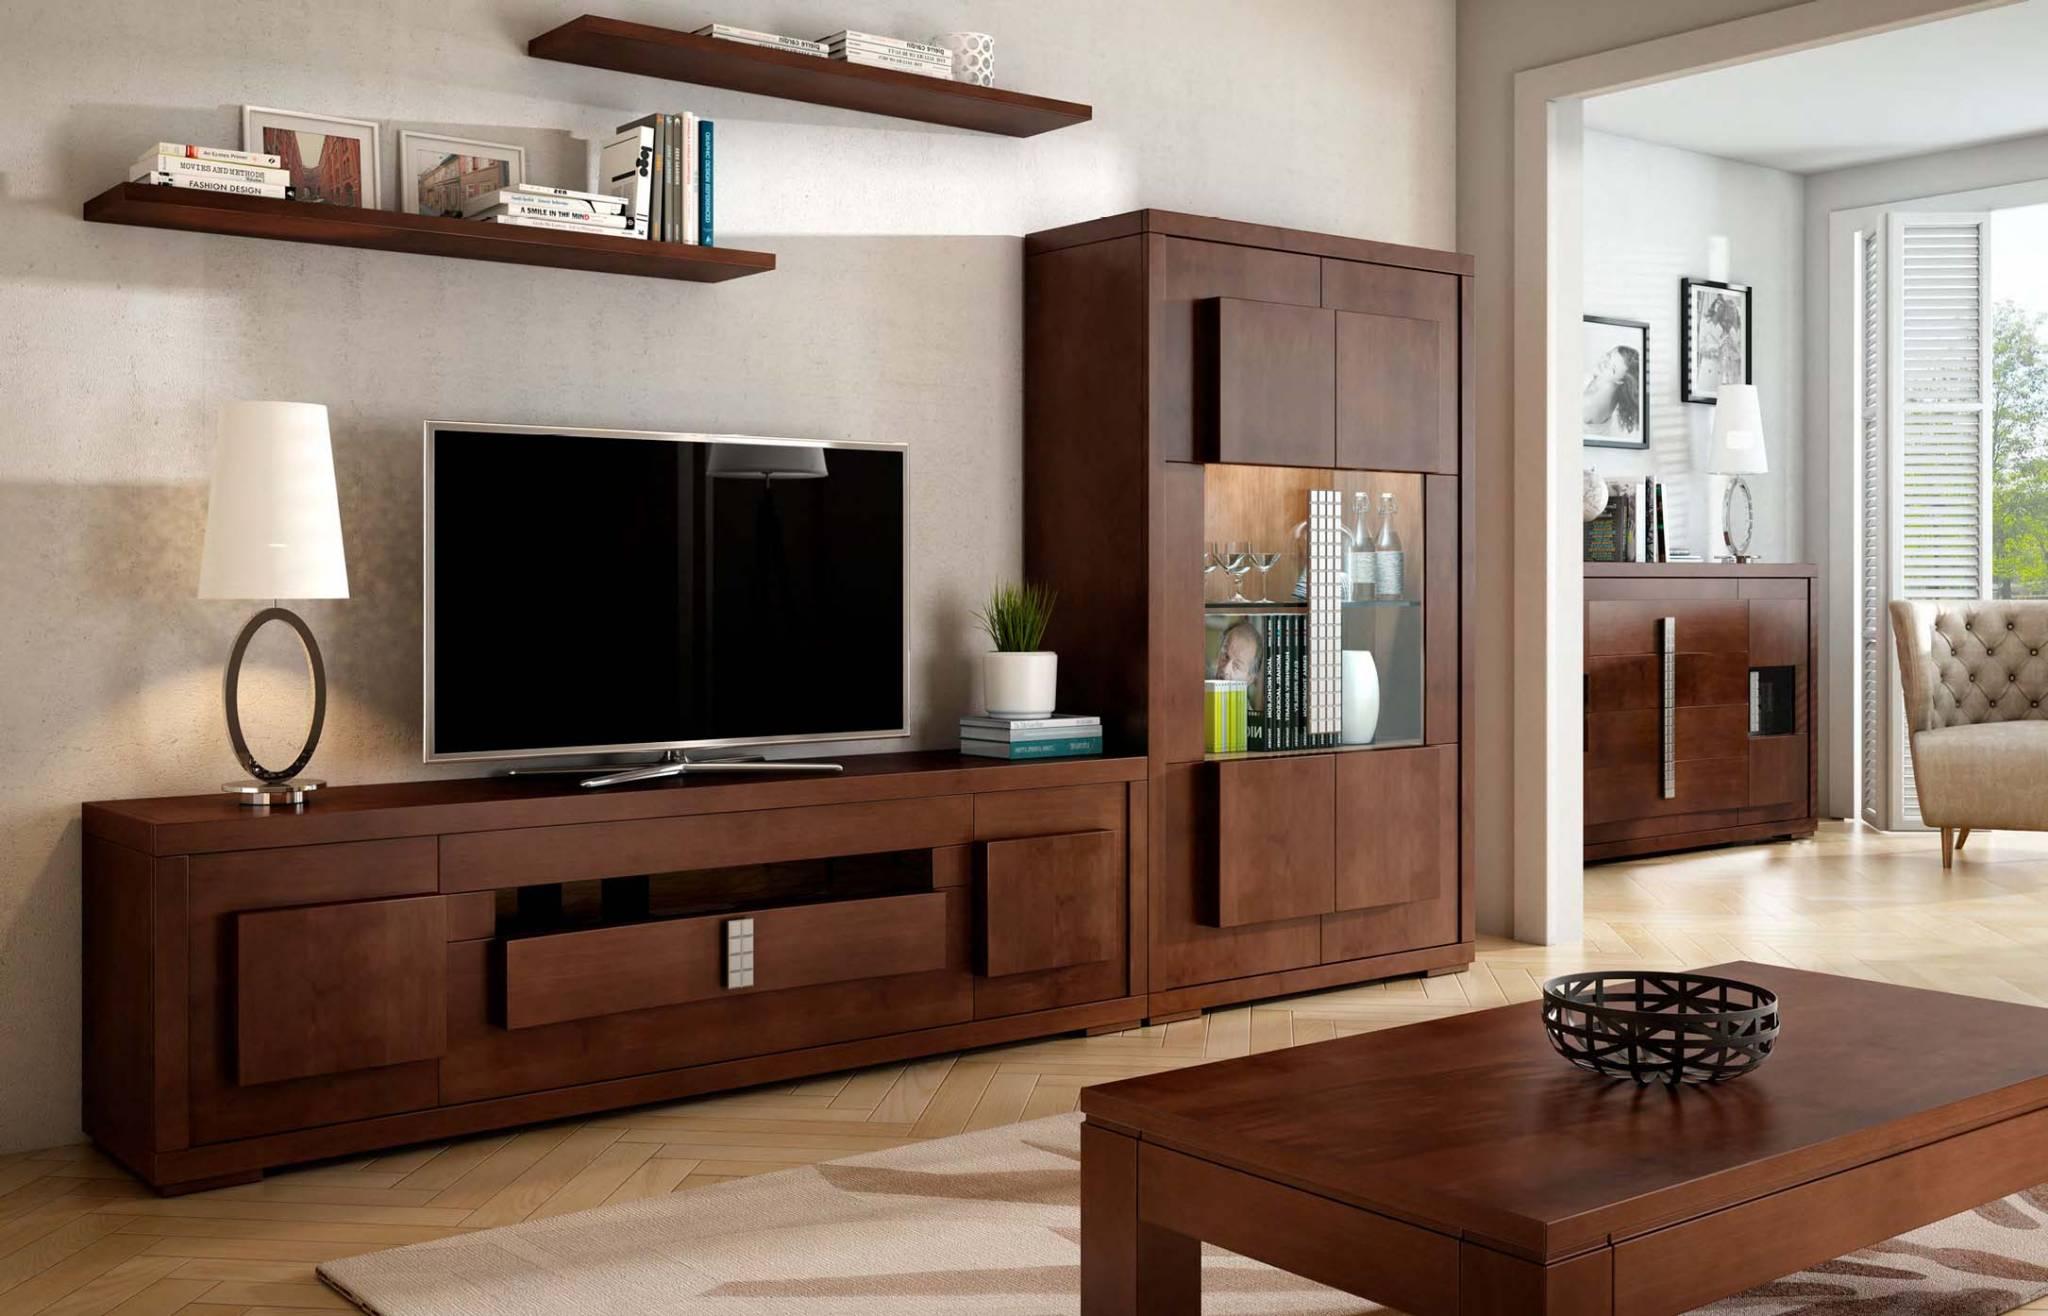 Muebles De Rinconera Para Salon Dise Os Arquitect Nicos  # Muebles Puchades